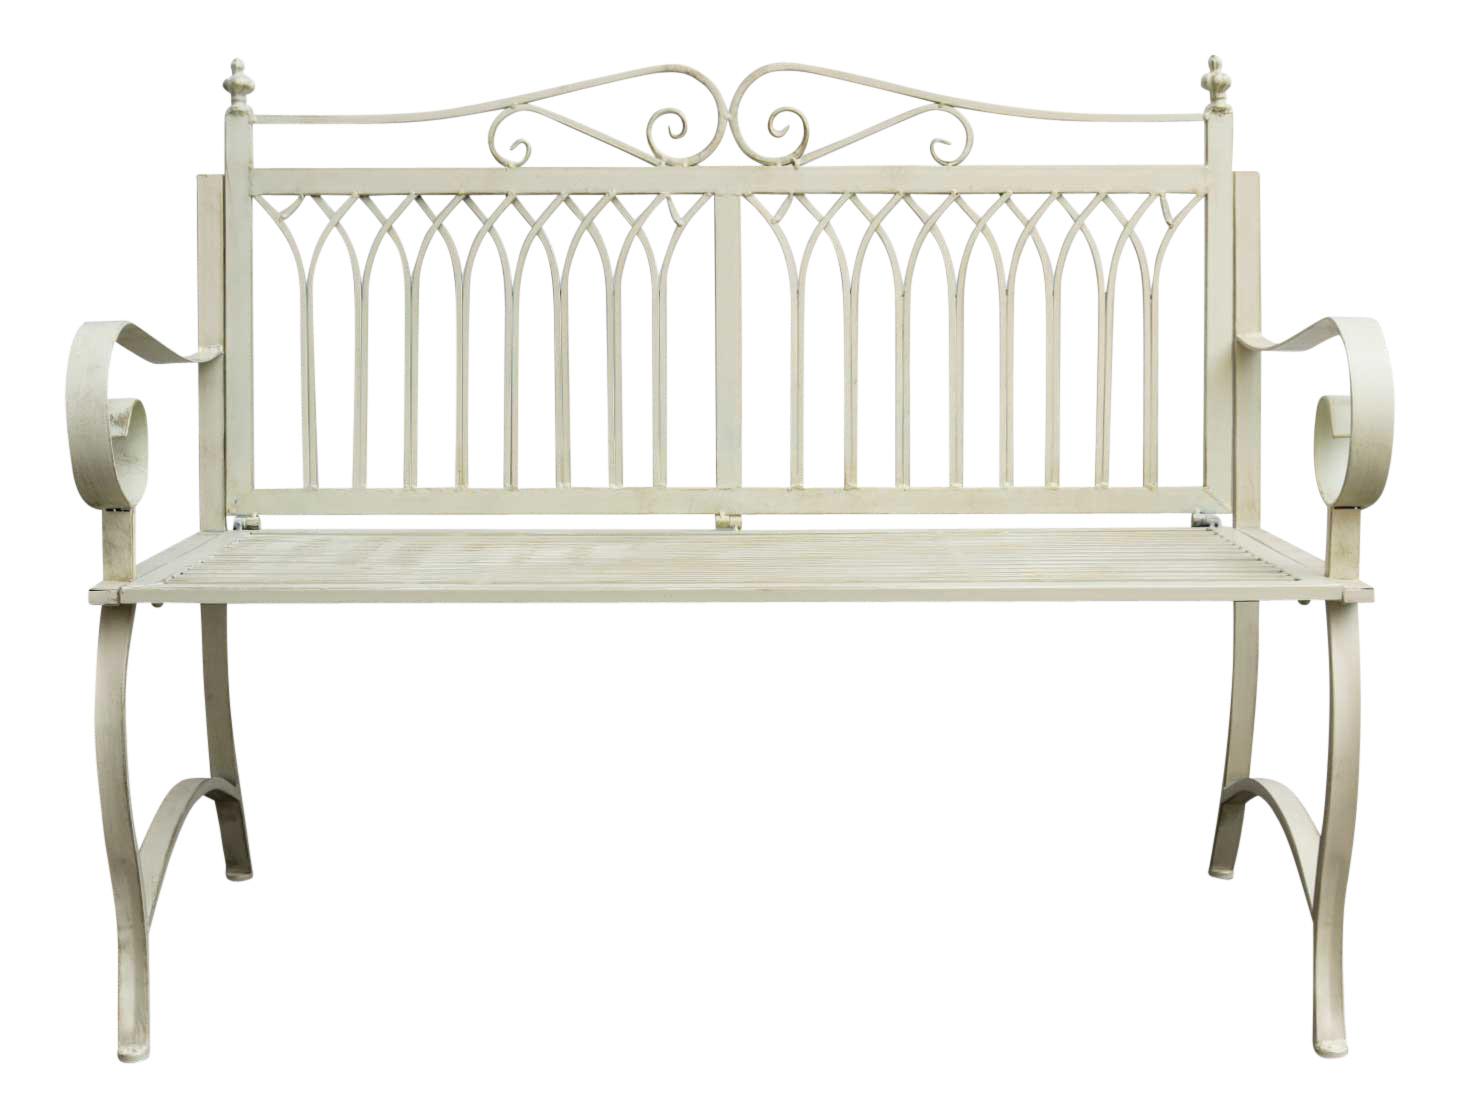 Antique Style Garden Bench Metal Cream White Furniture Park Nostalgic 119cm Ebay